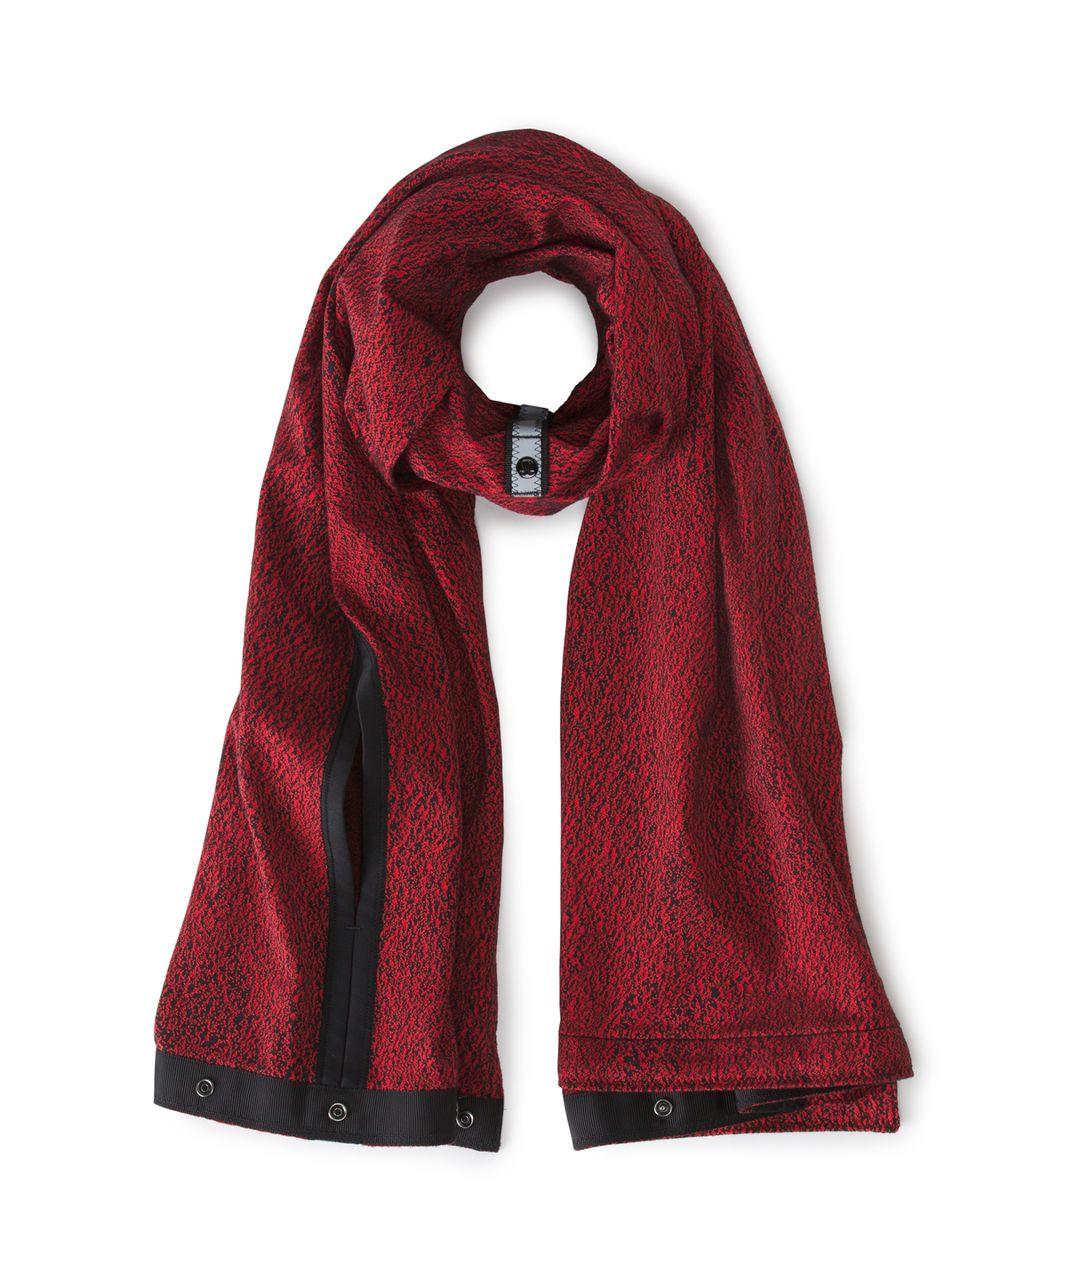 Lululemon Vinyasa Wrap - Running Luon Spray Jacquard True Red Black / Black